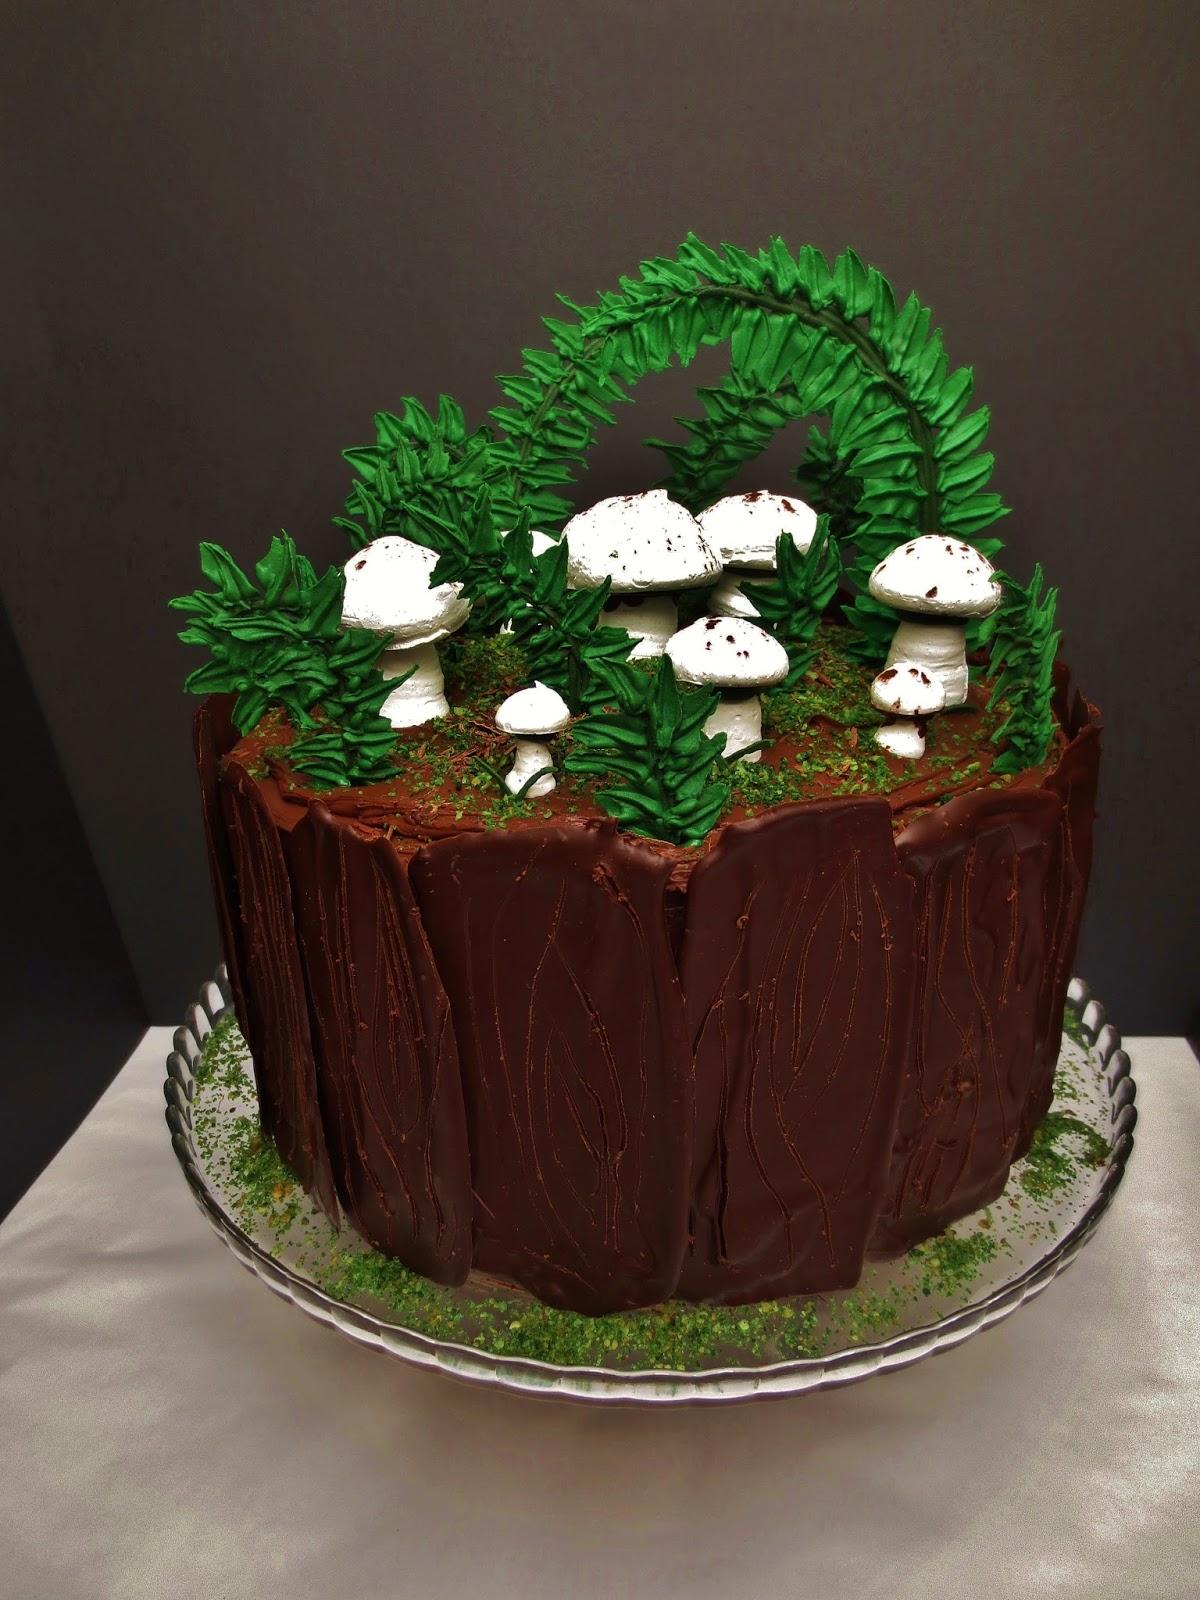 julias torten und t rtchen forest themed cake nougat torte. Black Bedroom Furniture Sets. Home Design Ideas